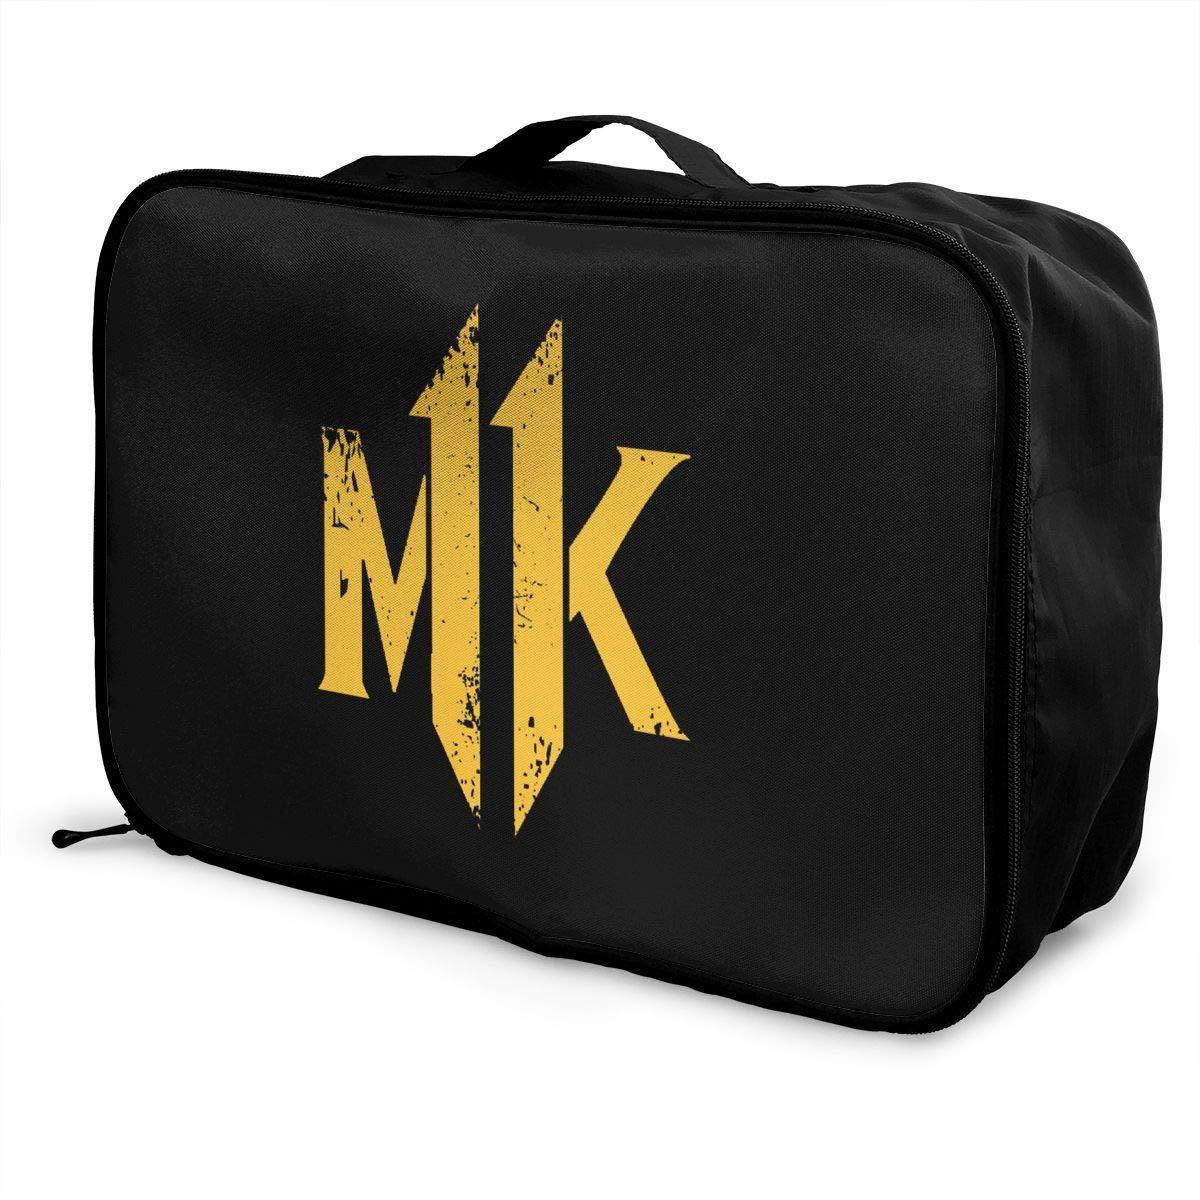 Fretlo MK Travel Duffel Bag Waterproof Lightweight Large Capacity Portable Luggage Bag Black